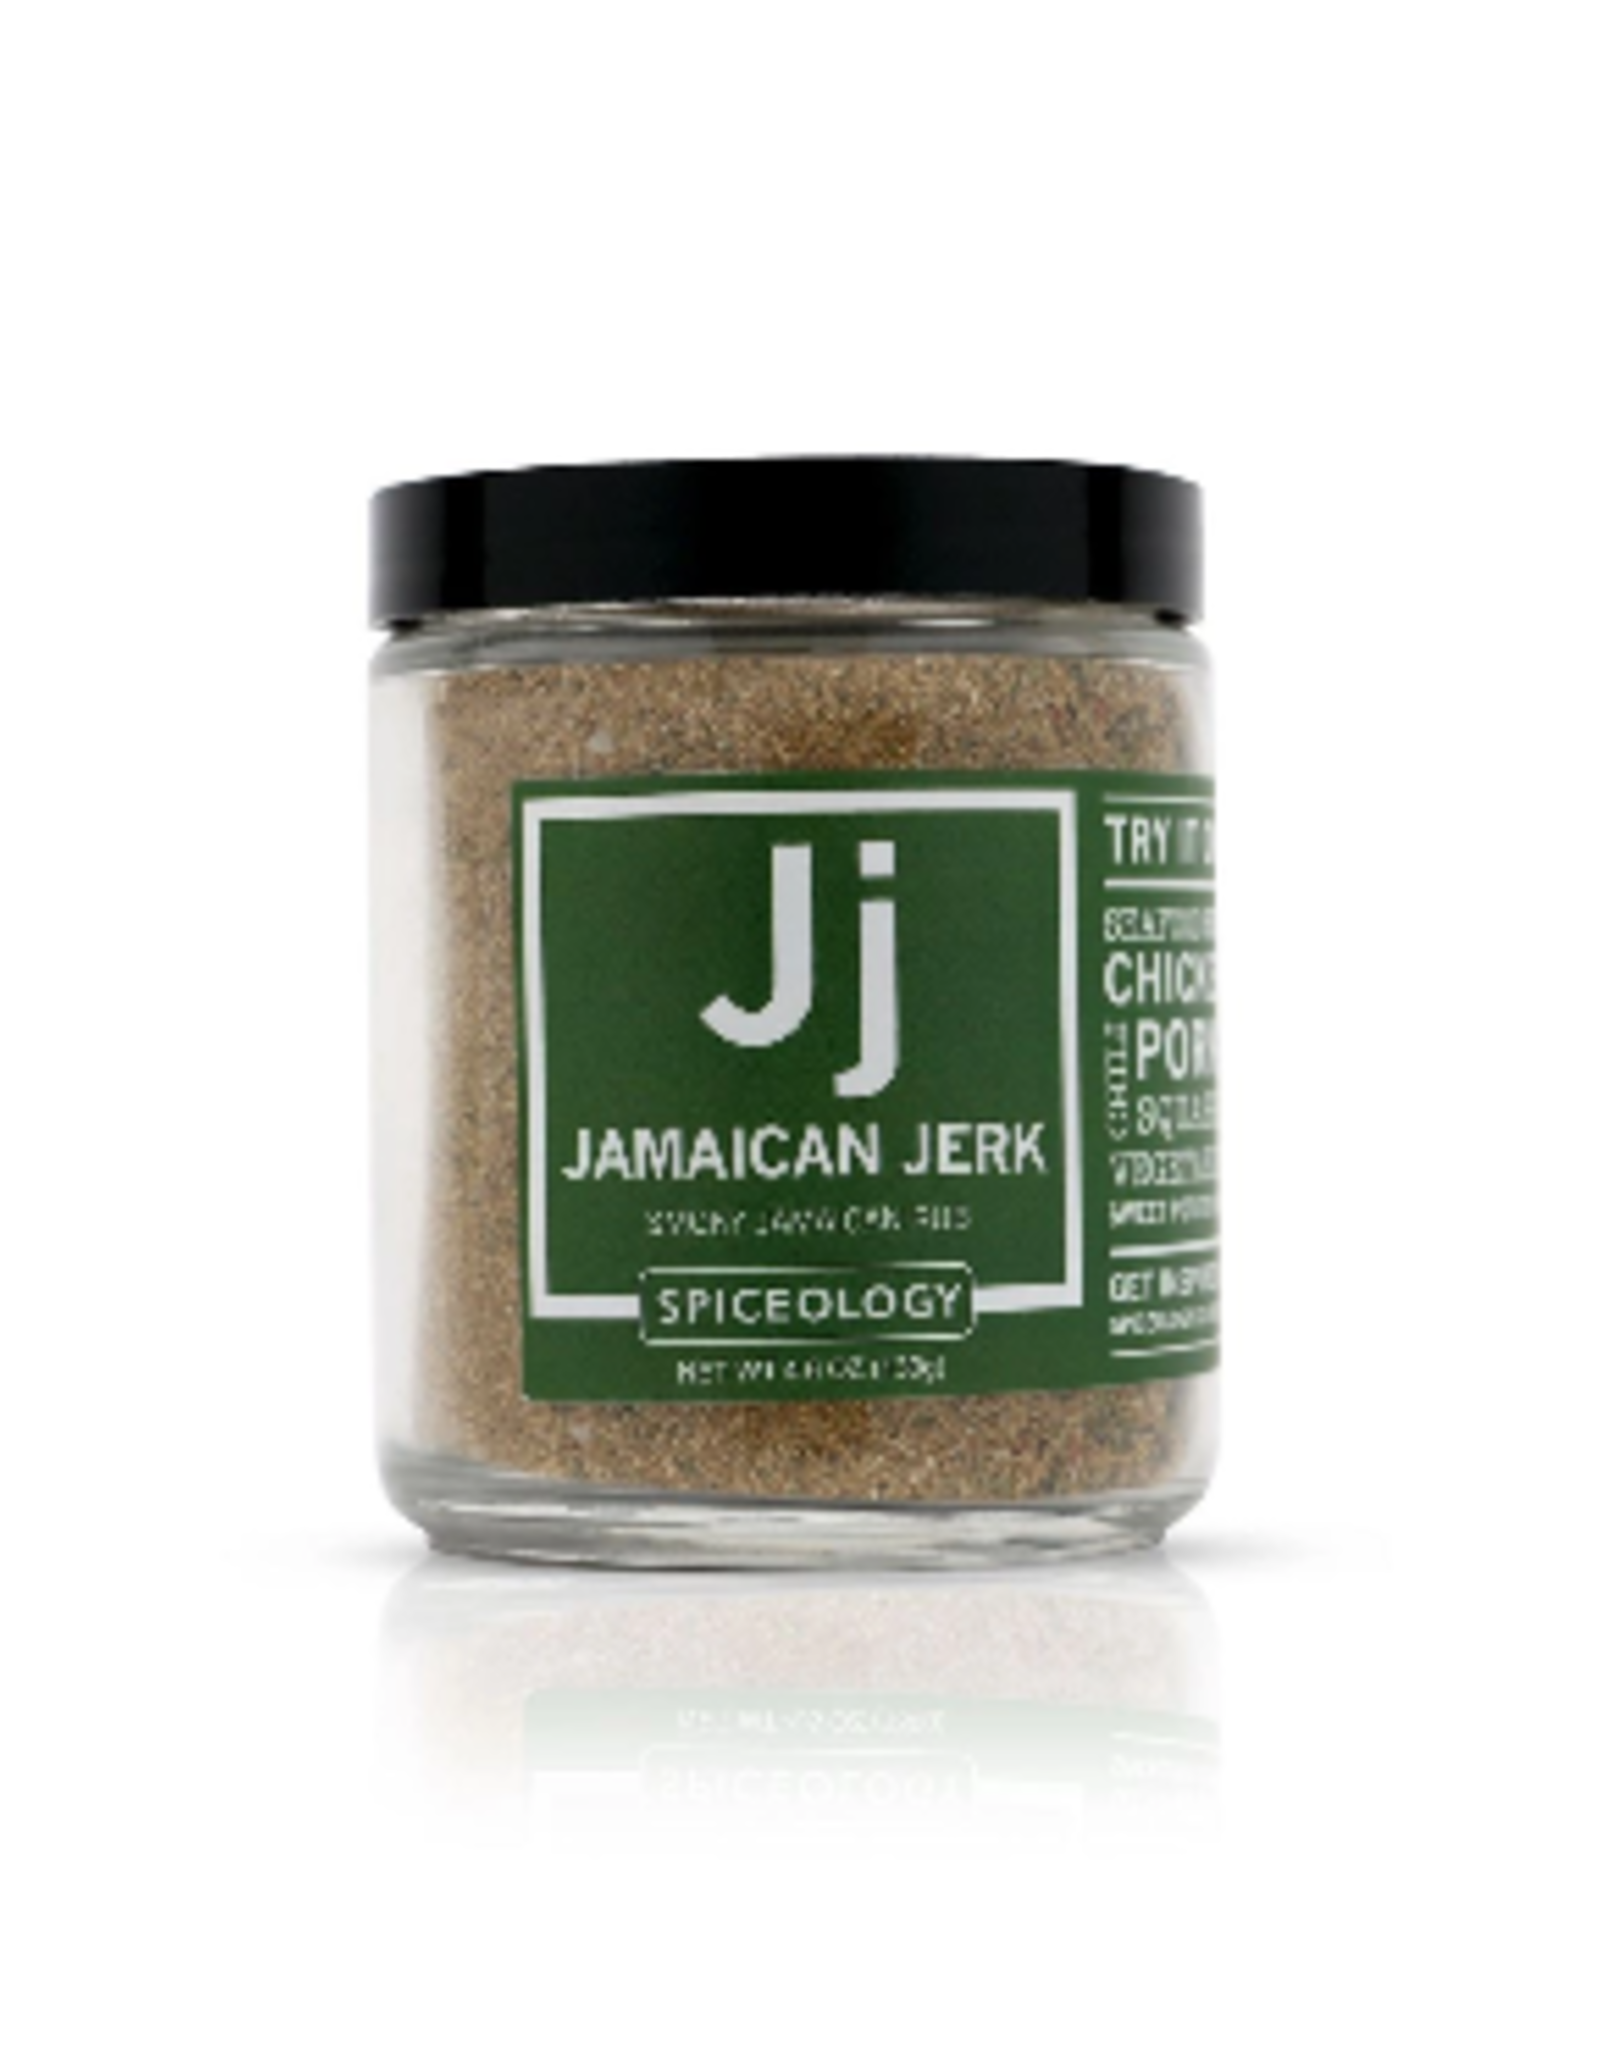 Spiceology Jamaican Jerk, Jar